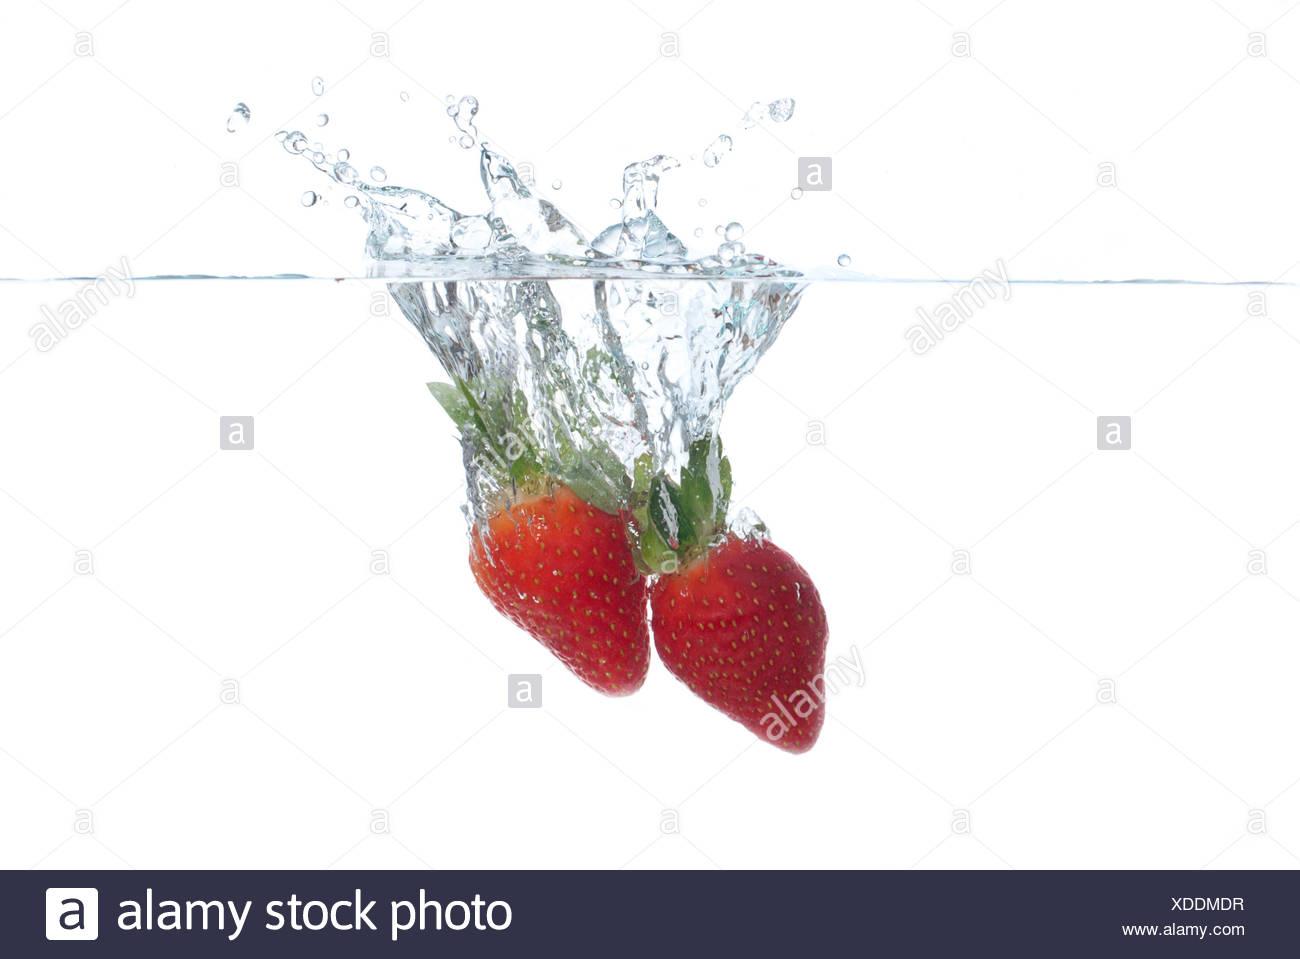 Strawberries splashing into water - Stock Image